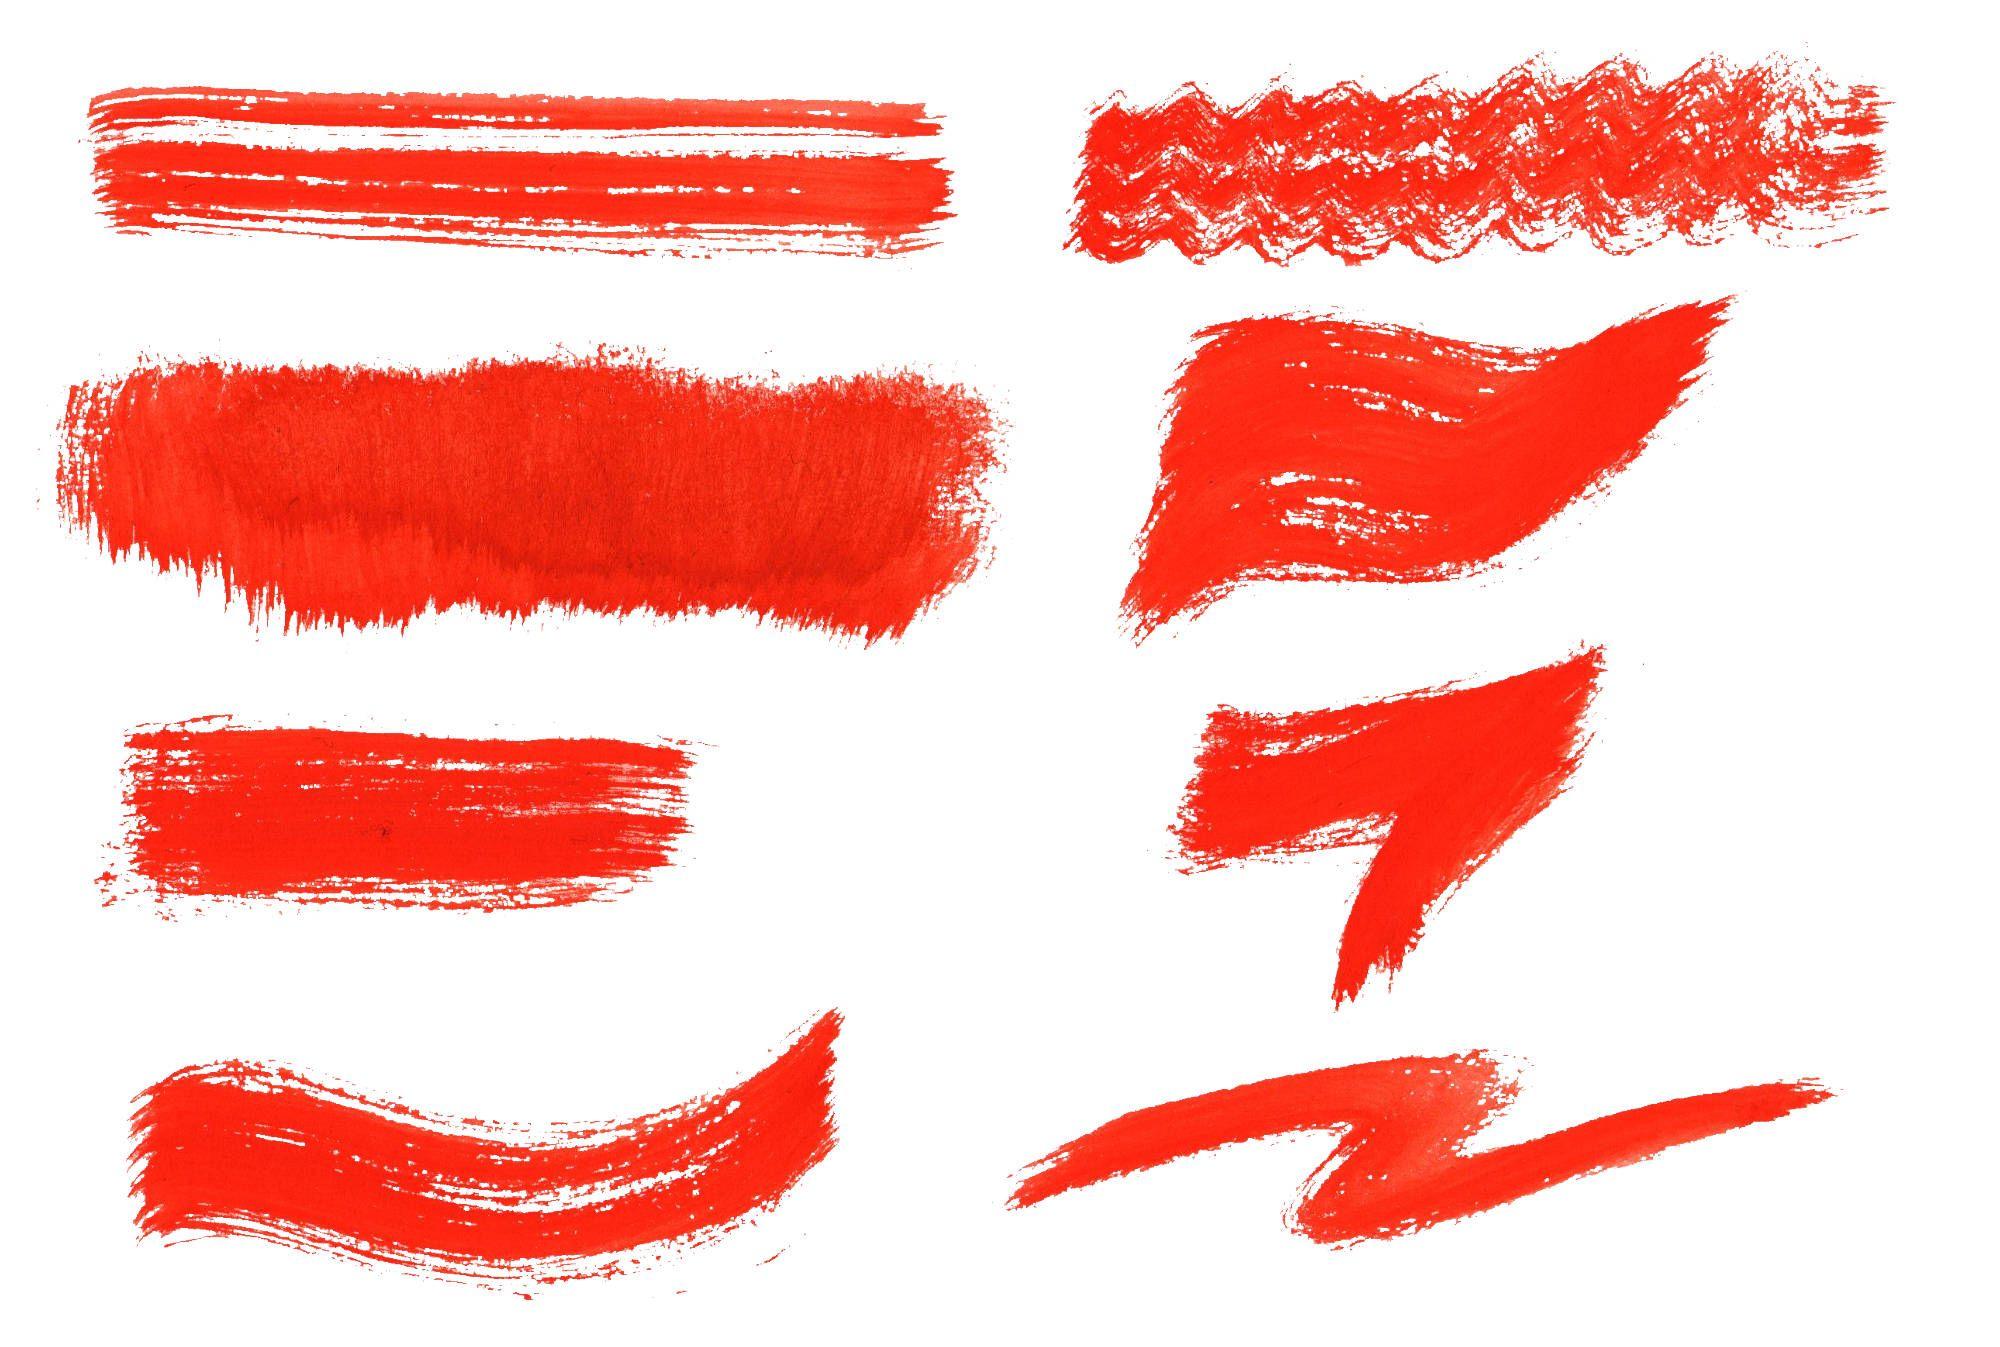 8 Dry Red Watercolor Brush Stroke Png Transparent Onlygfx Com Brush Stroke Png Watercolor Brushes Brush Strokes